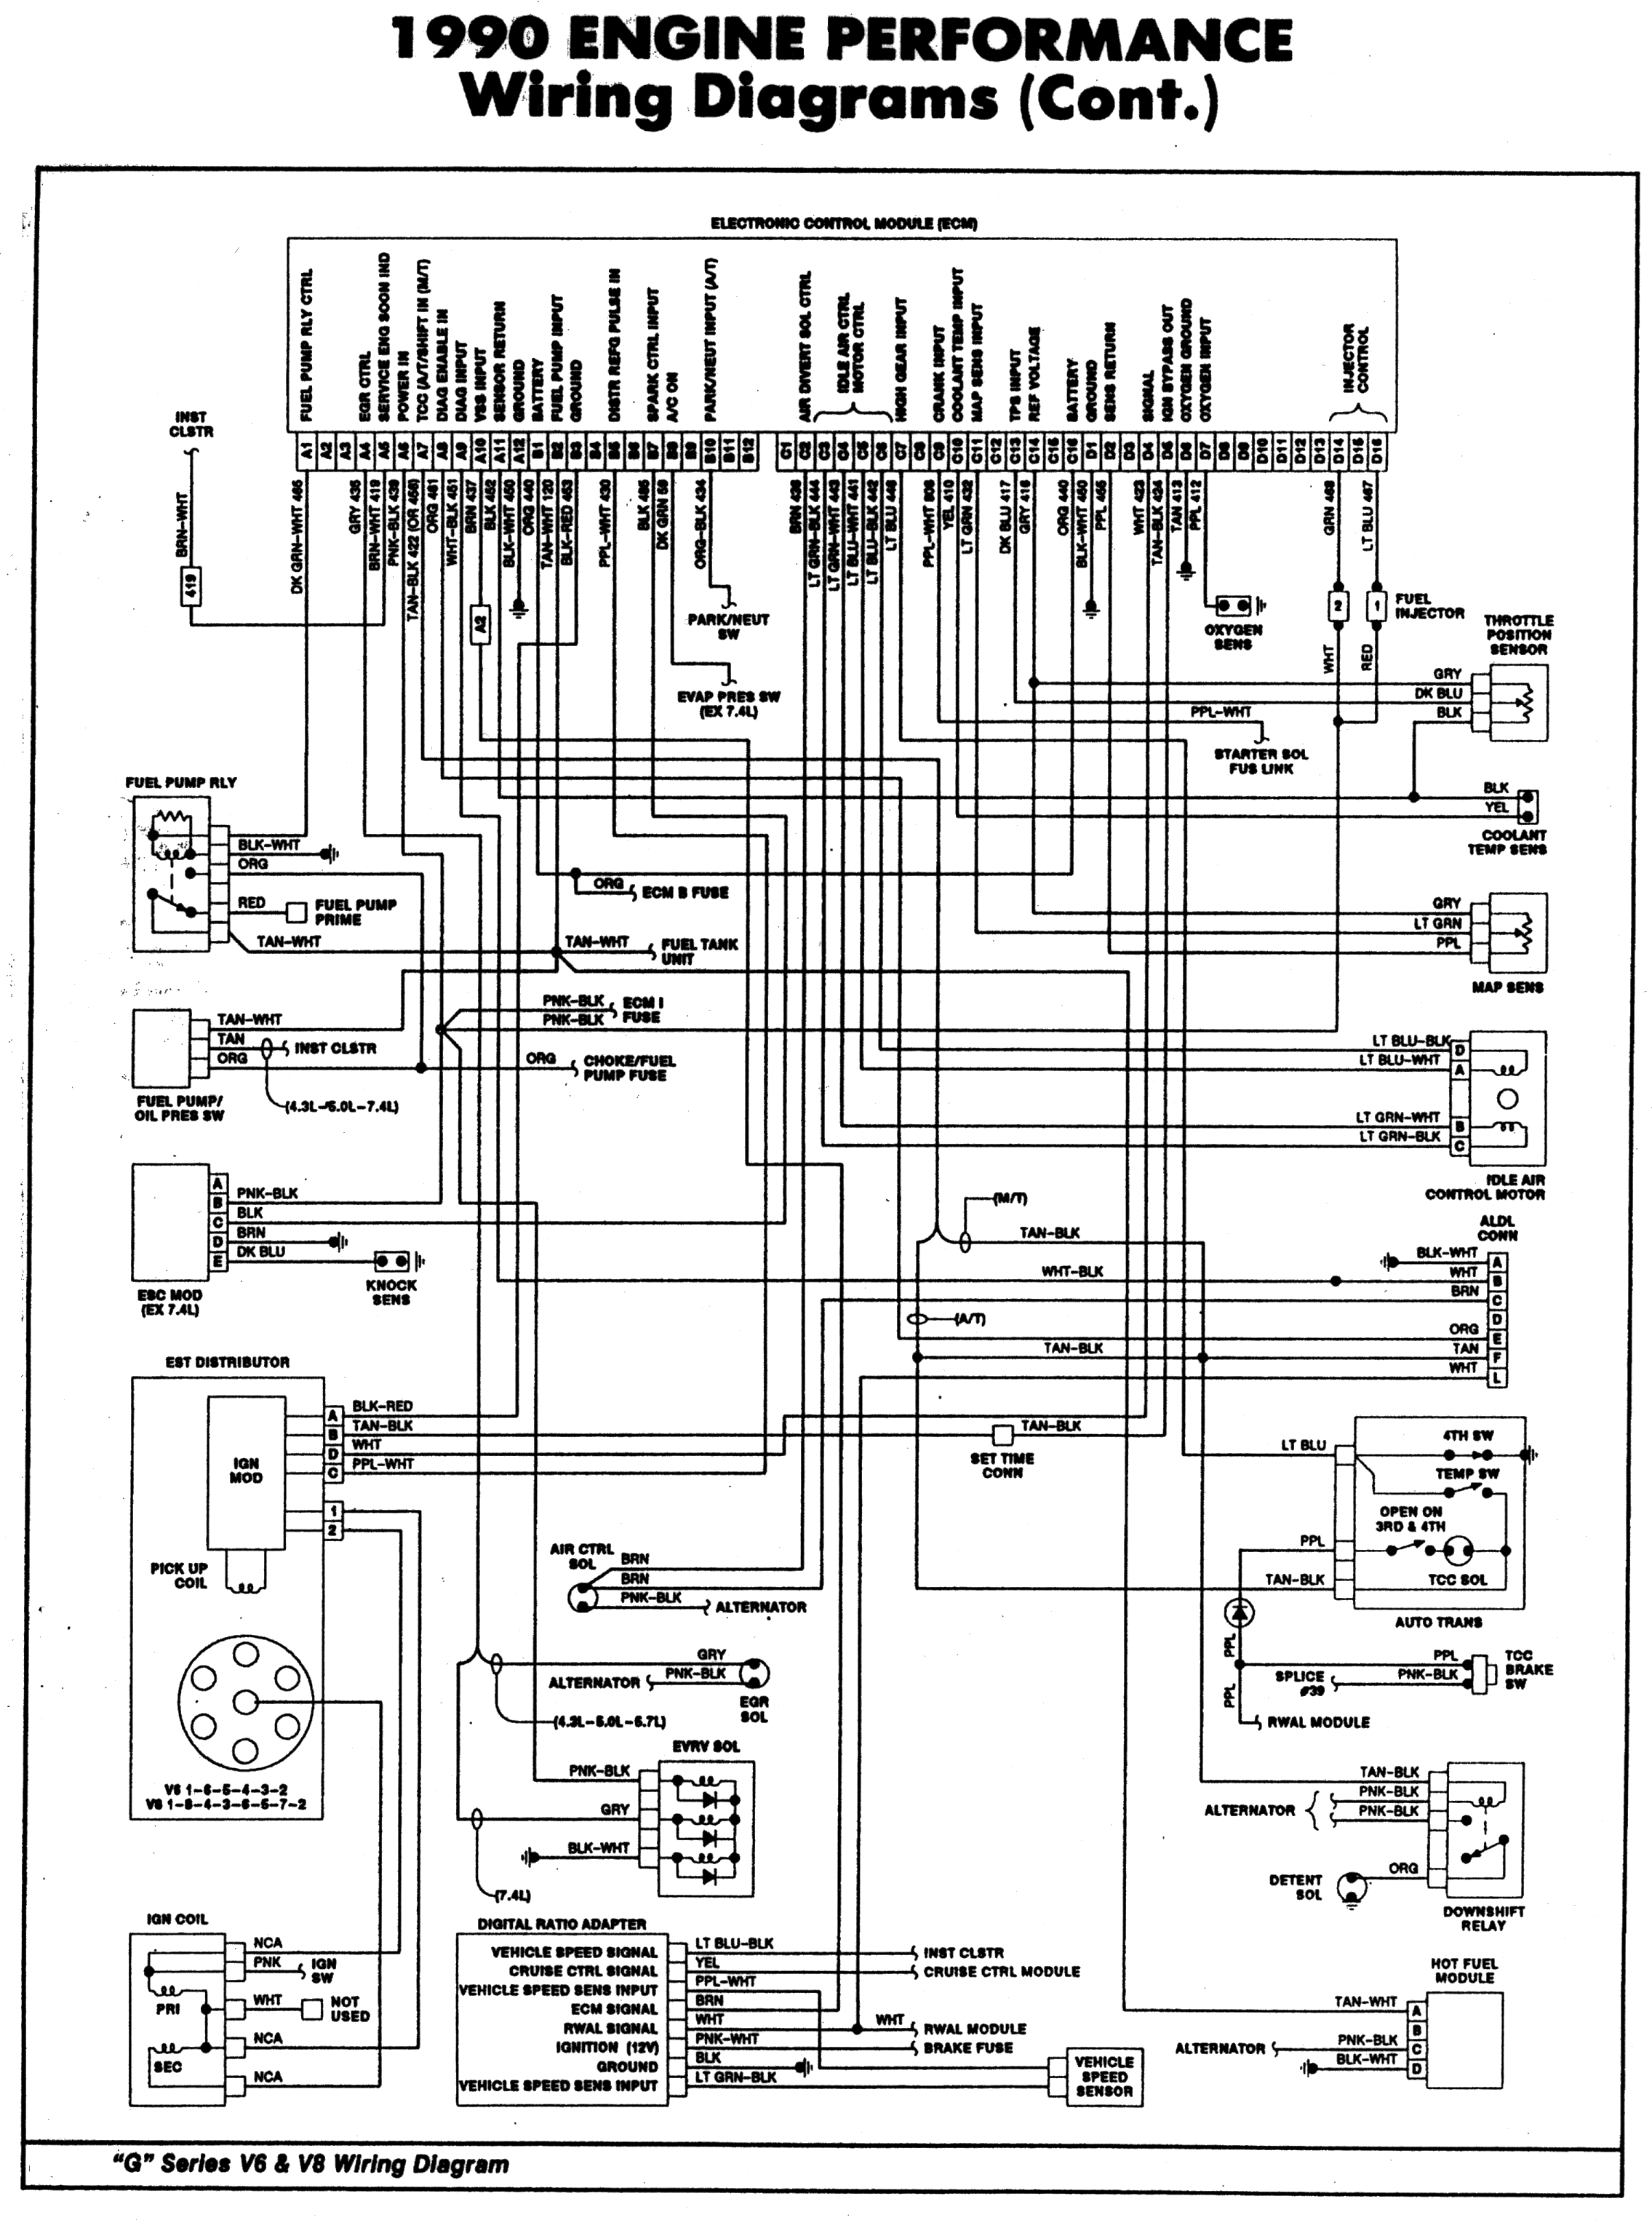 Wiring Diagram Of Solar Panel System Ef37611ed0813a39b0823626ba6b2667 Electrical Wiring Diagram Chevy Trucks Chevy Pickups